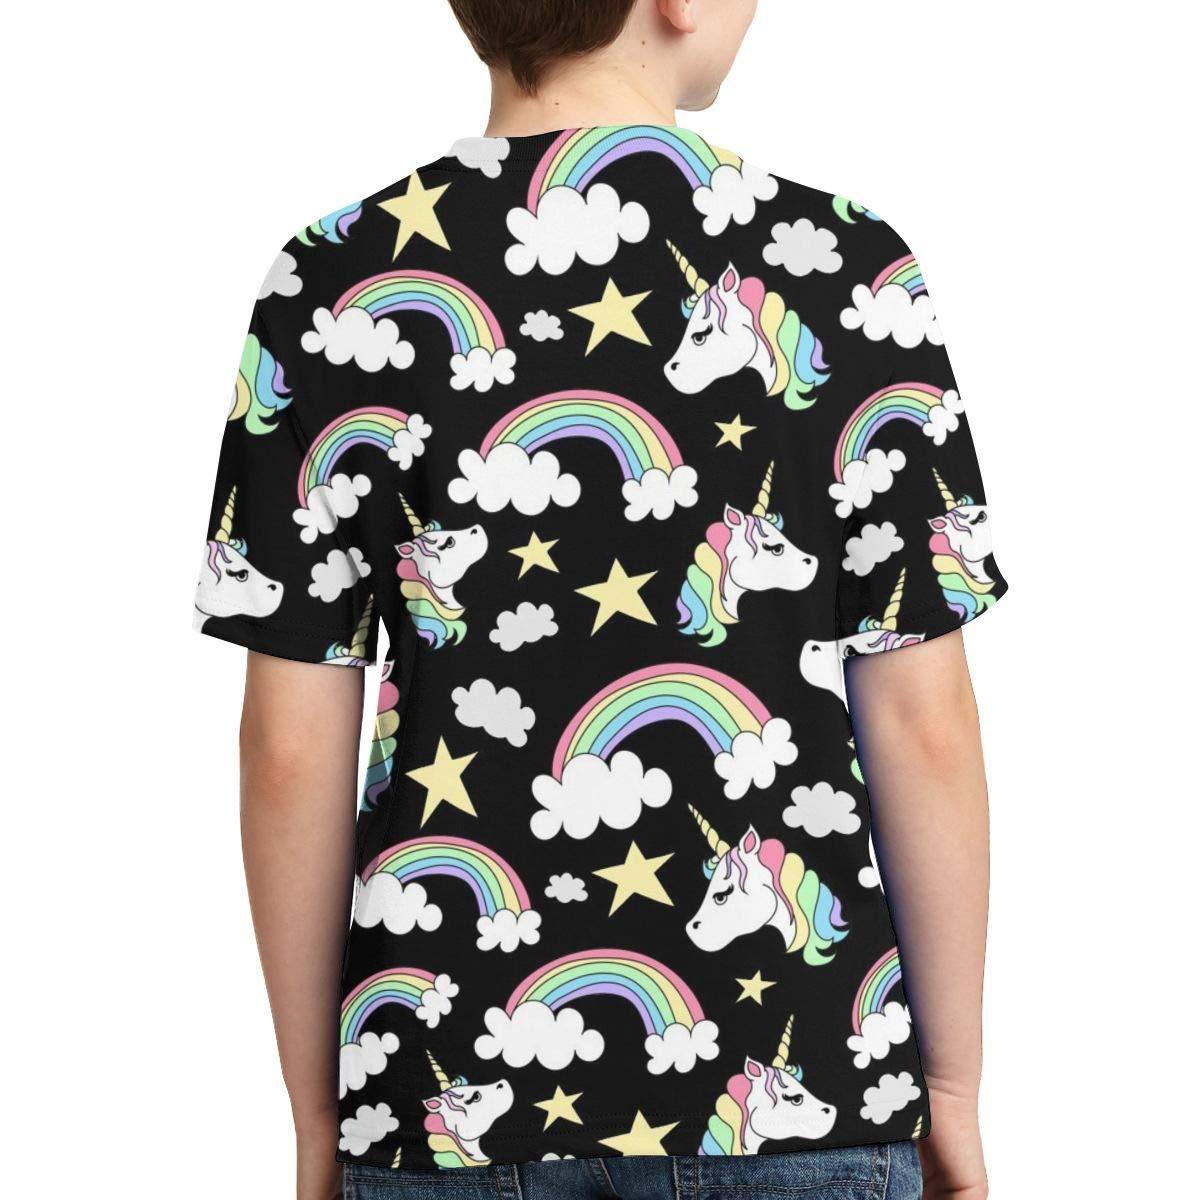 Pattern of Unicorns and Rainbows Kids Print Graphic Tee Short Sleeve T-Shirt